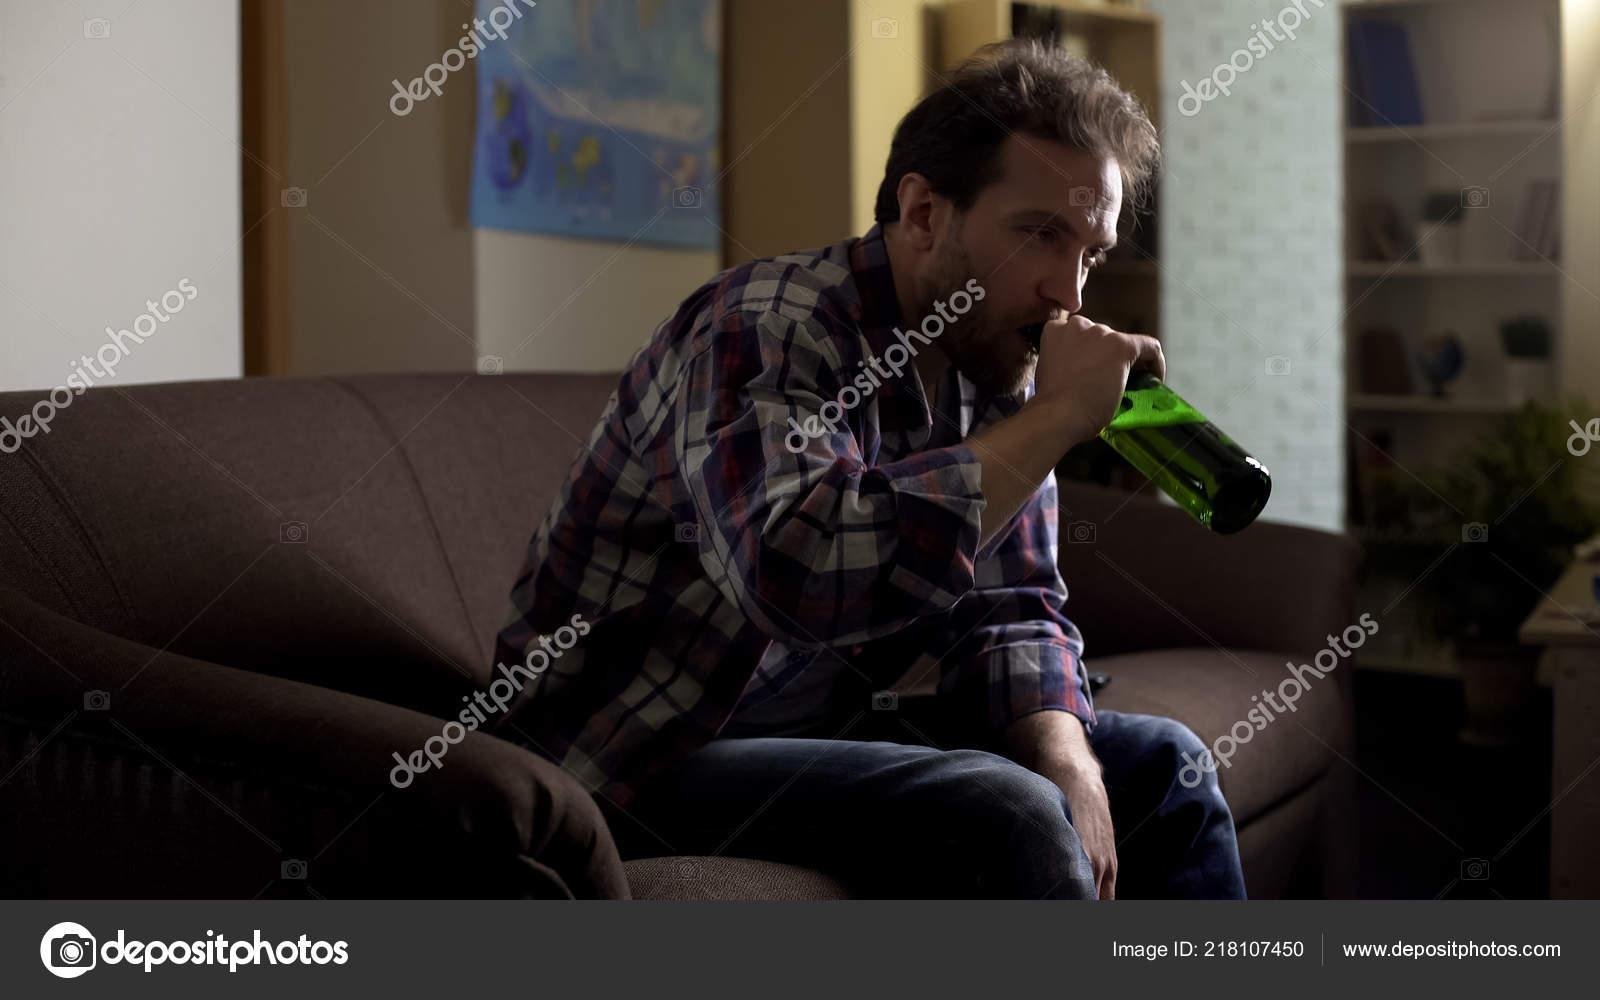 Randi egy alkoholista ember